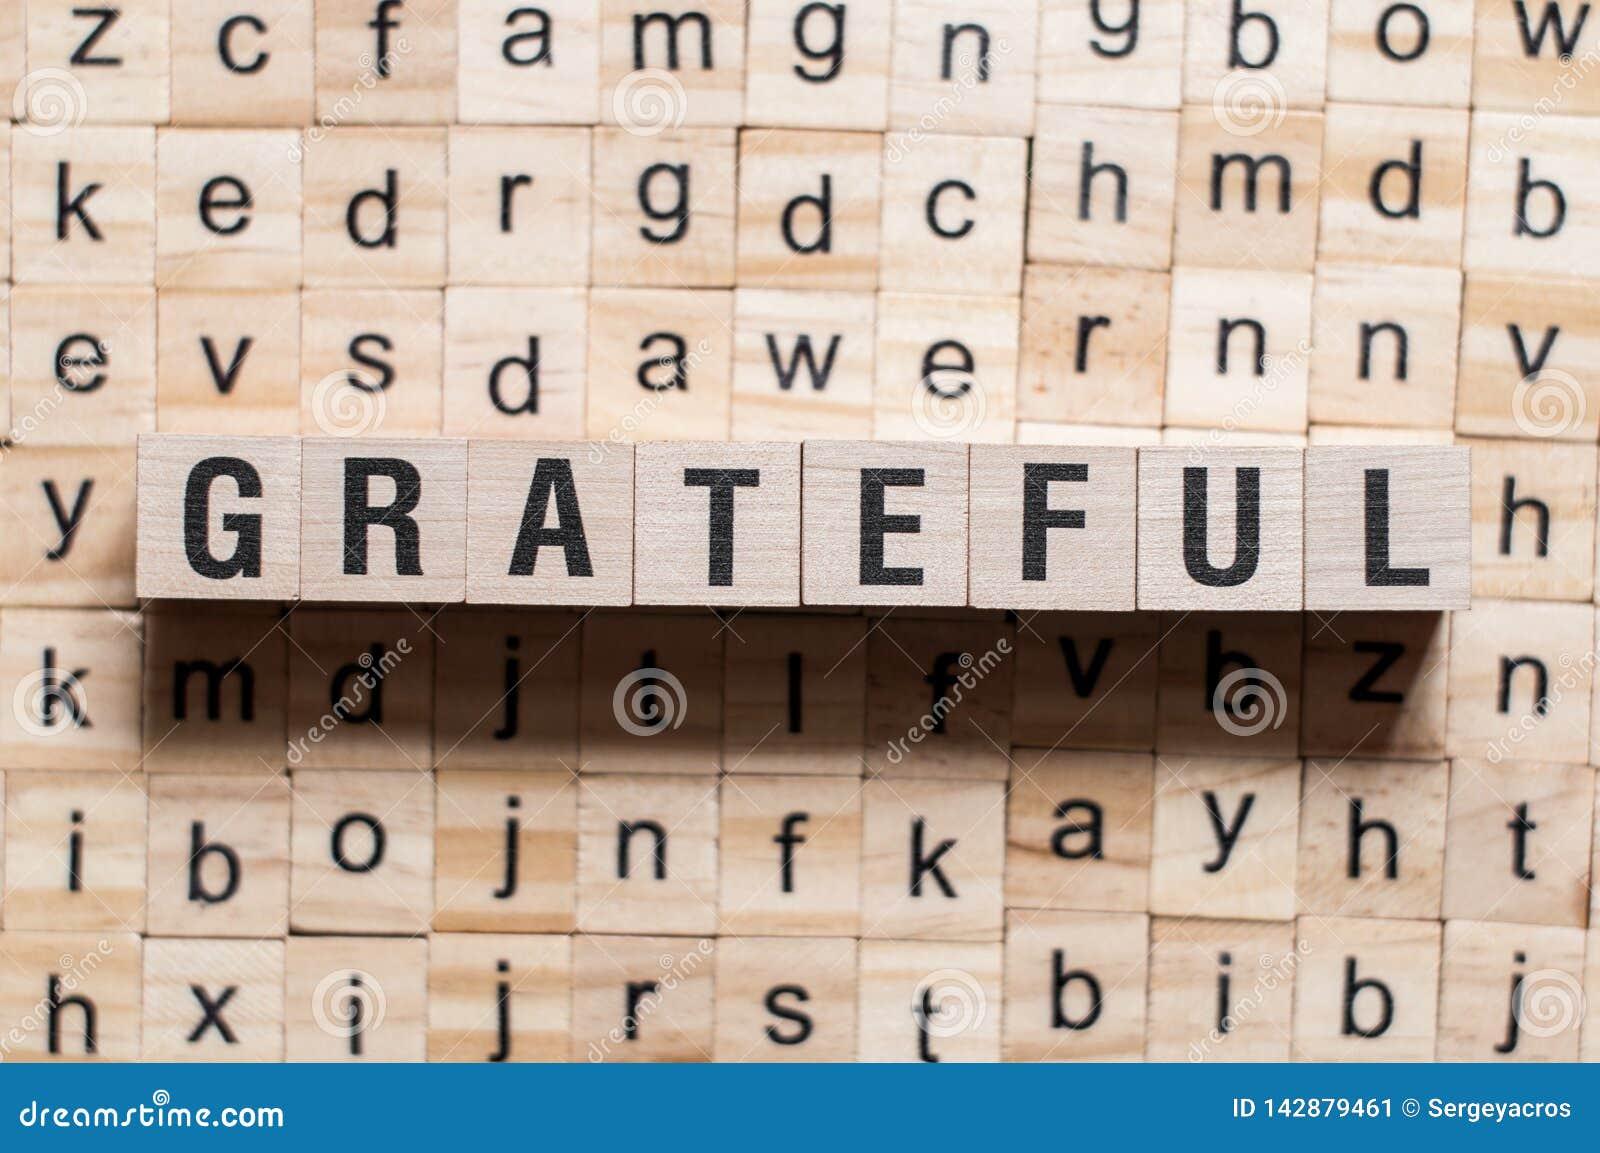 Grateful word concept